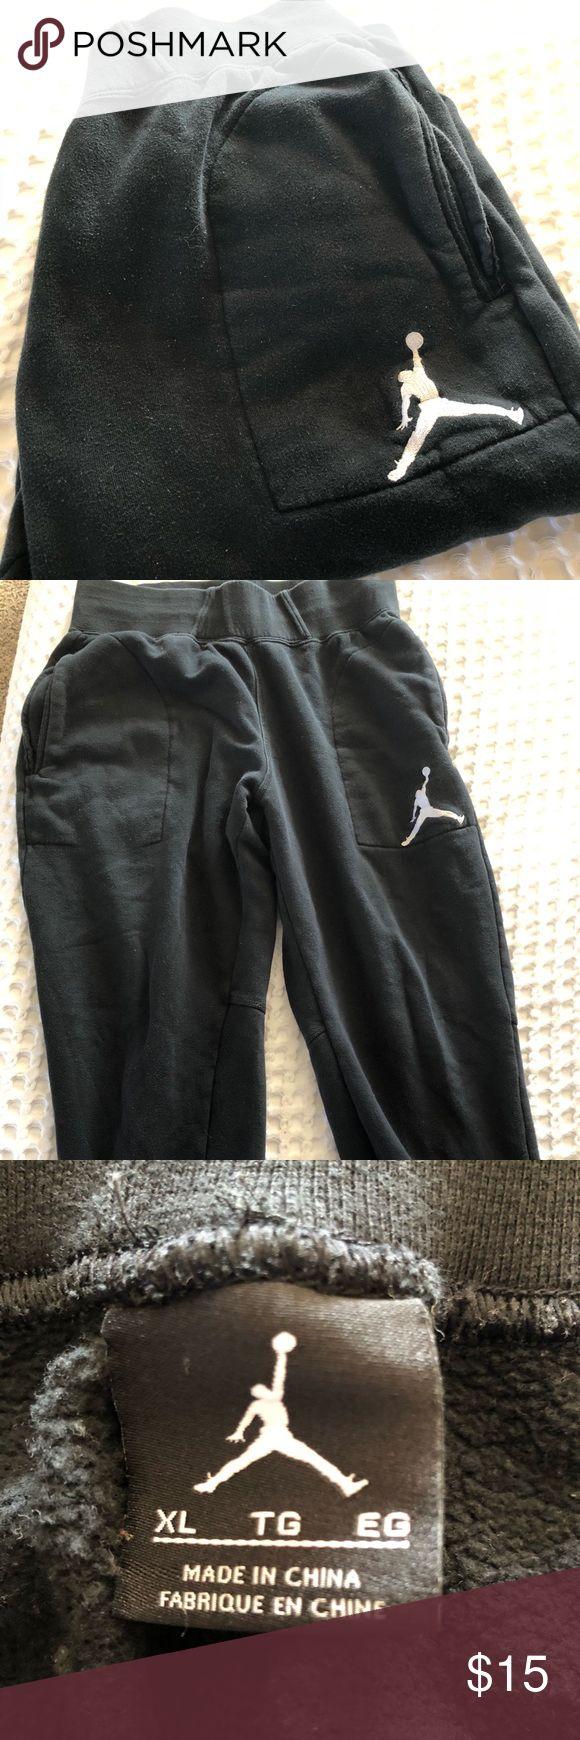 Air Jordan sweat pants Air Jordan Sweat pants  Size xl  Good condition Air Jordan Pants Sweatpants & Joggers